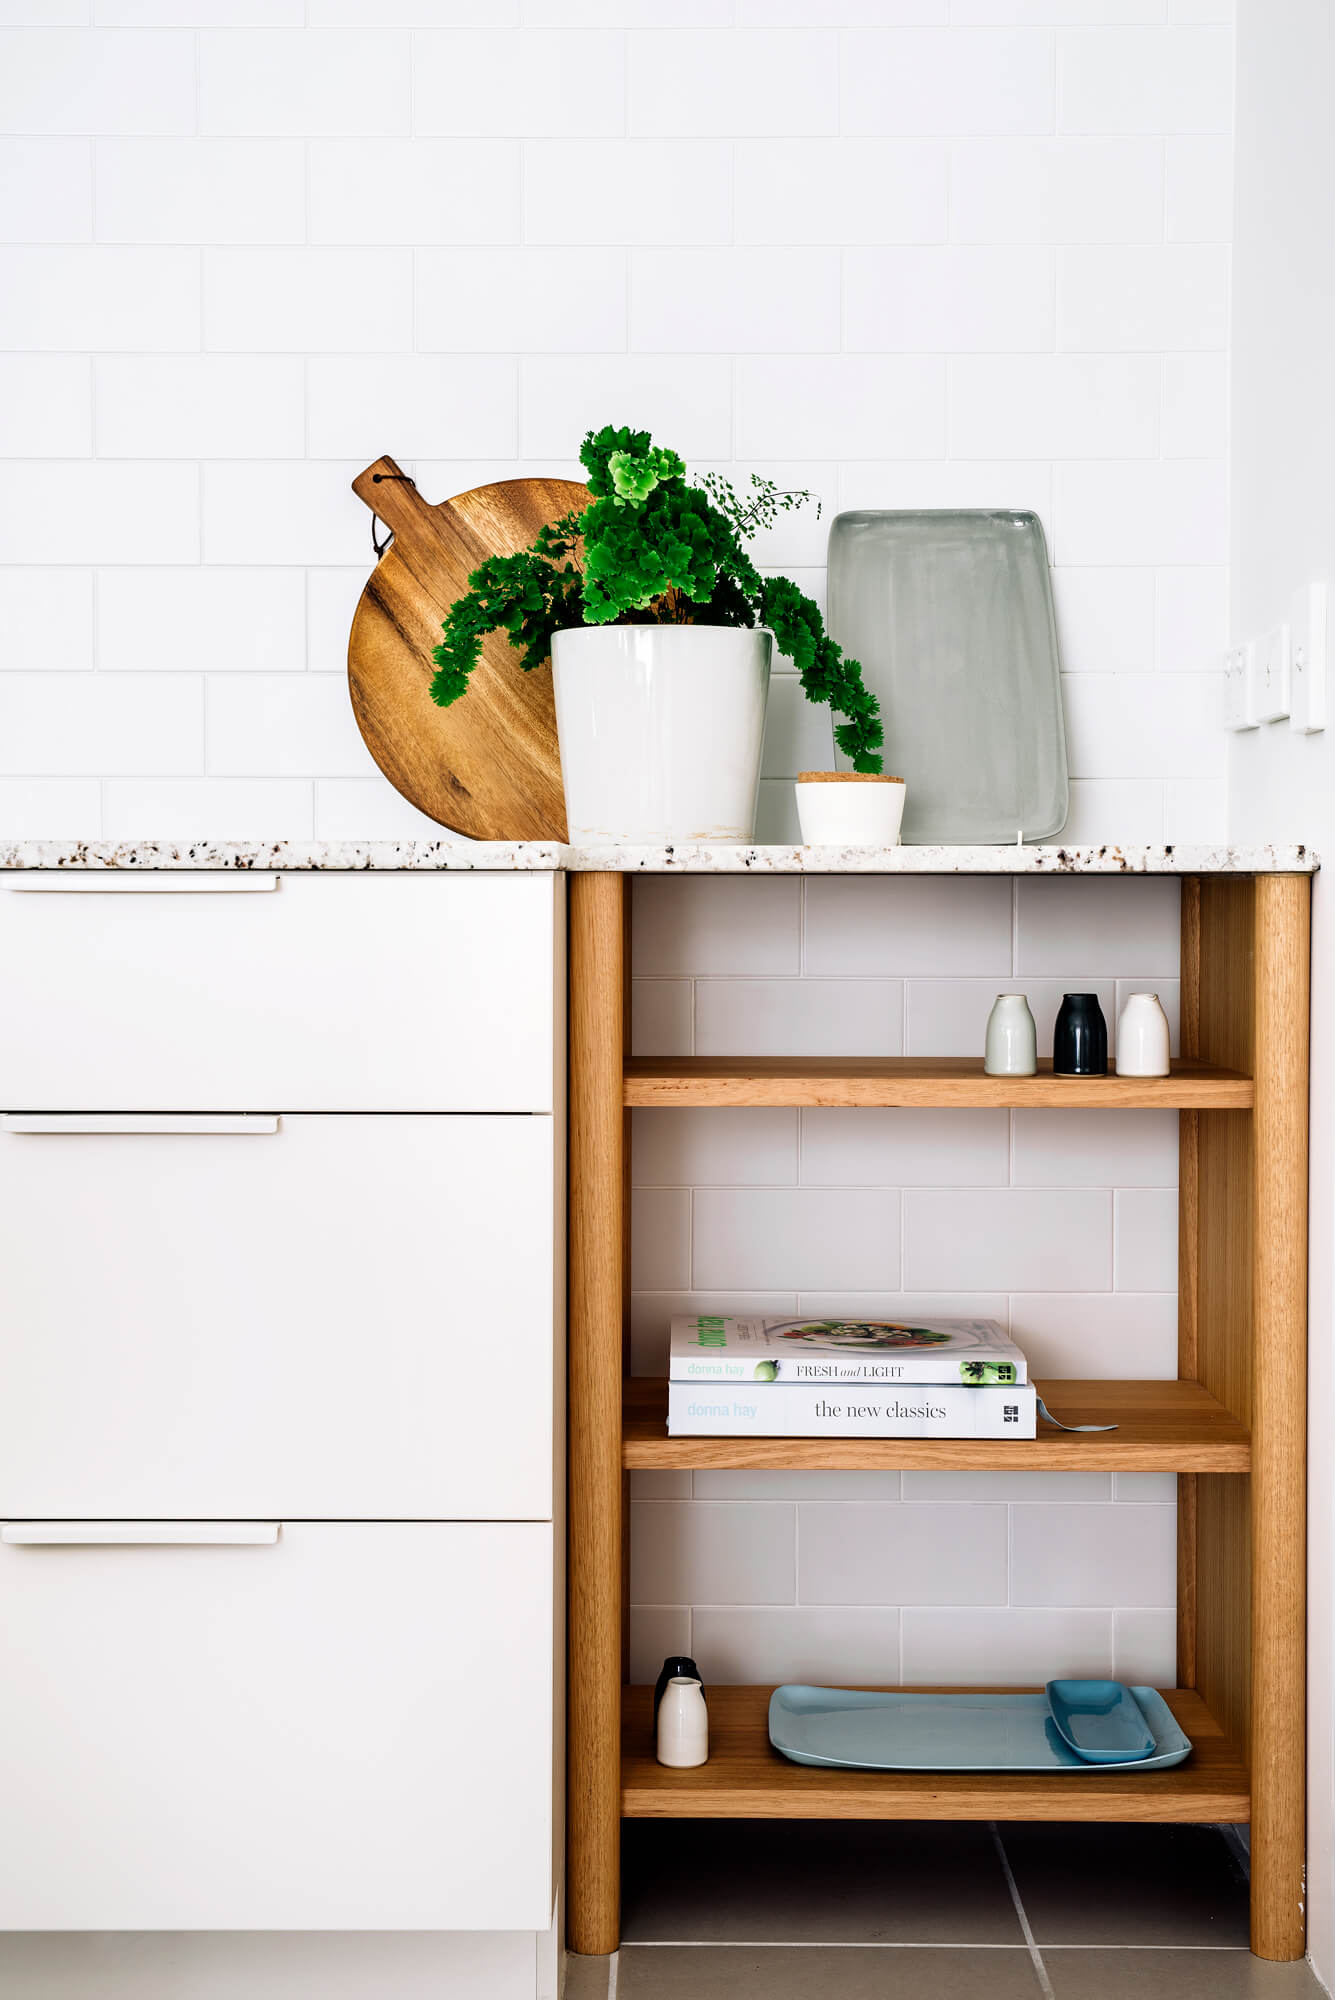 georgia-cannon-interior-designer-brisbane-project-r1-kitchen-6918.jpg